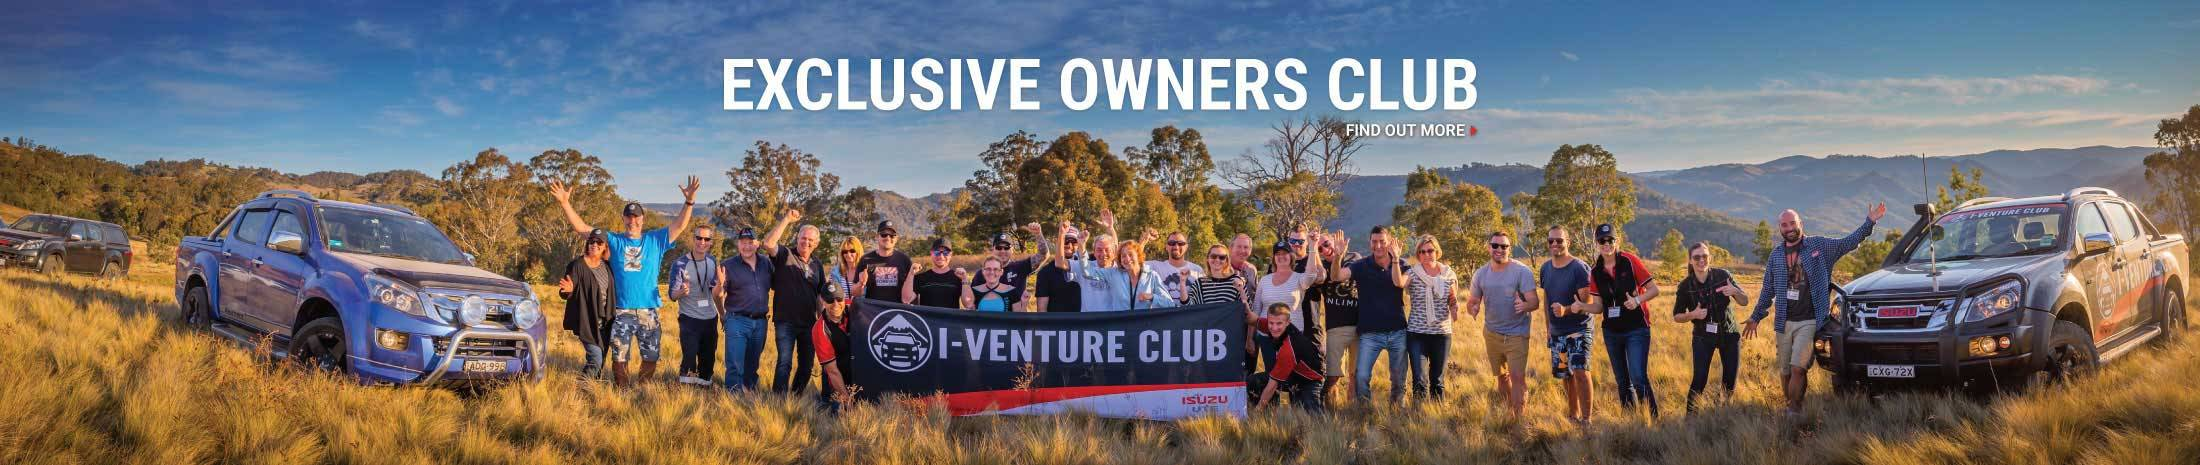 iua-iventure-banner-v4-new